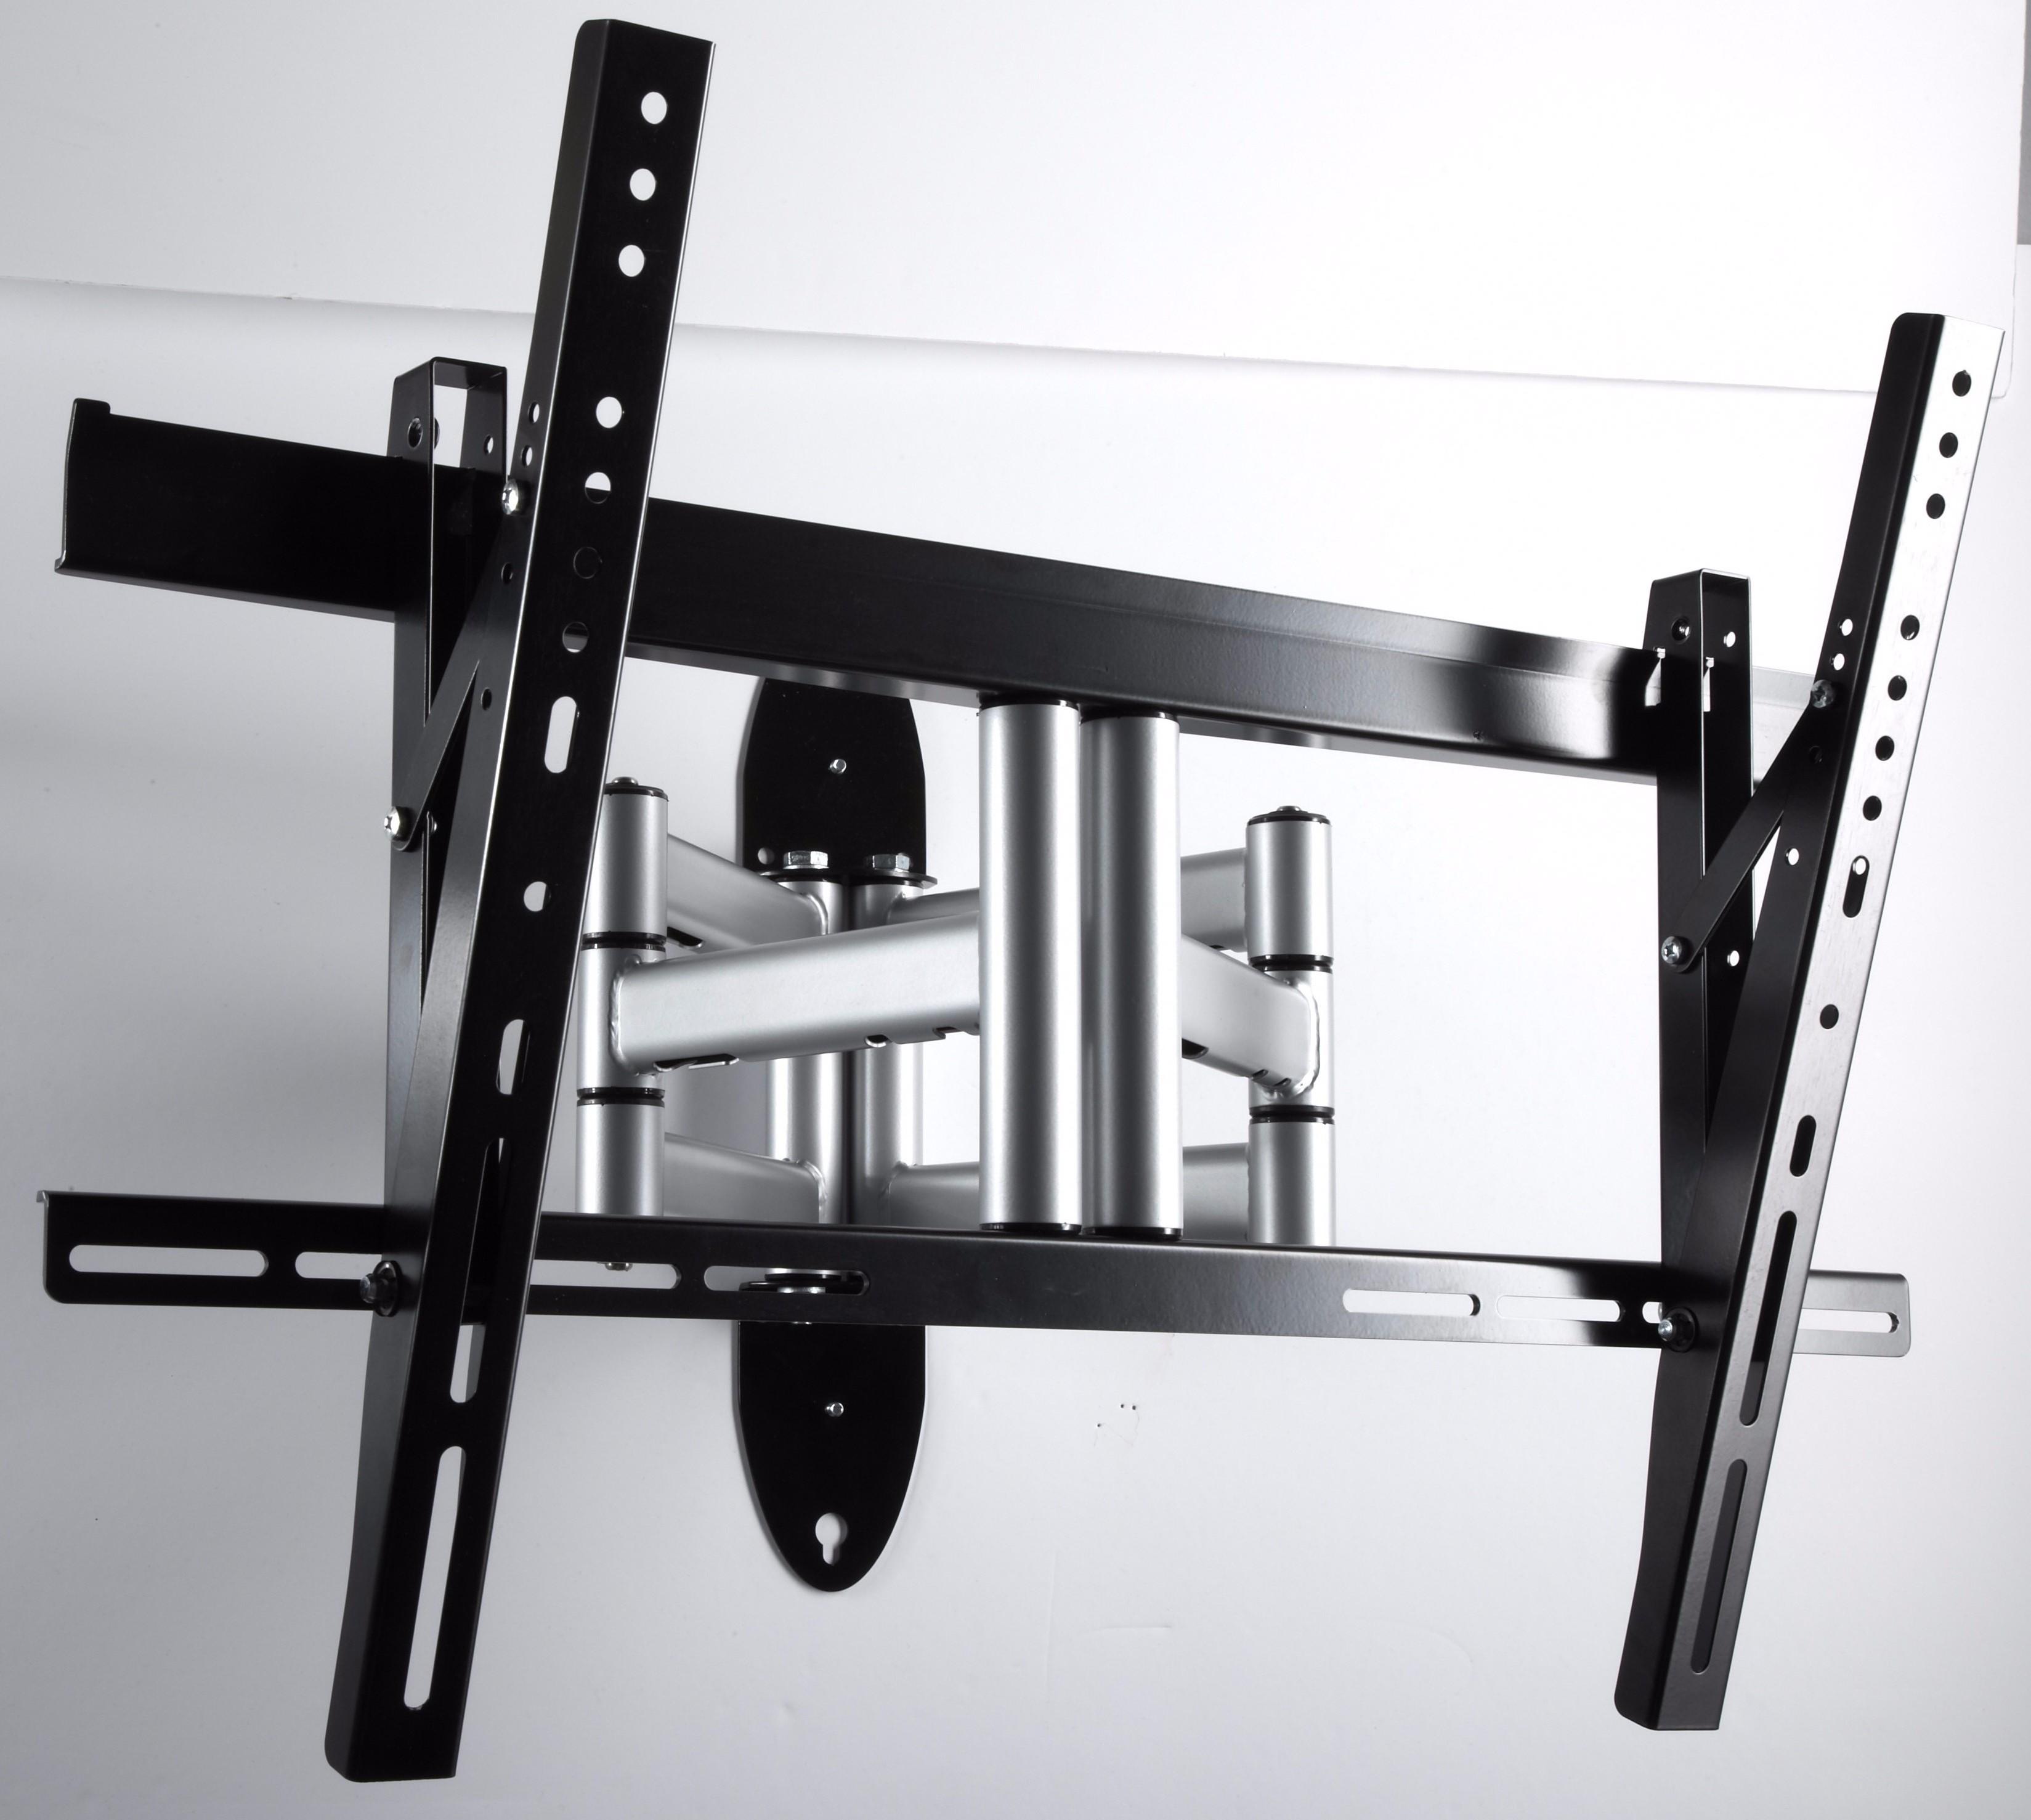 Articulated TV bracket AB-LU700MA - 02.jpg